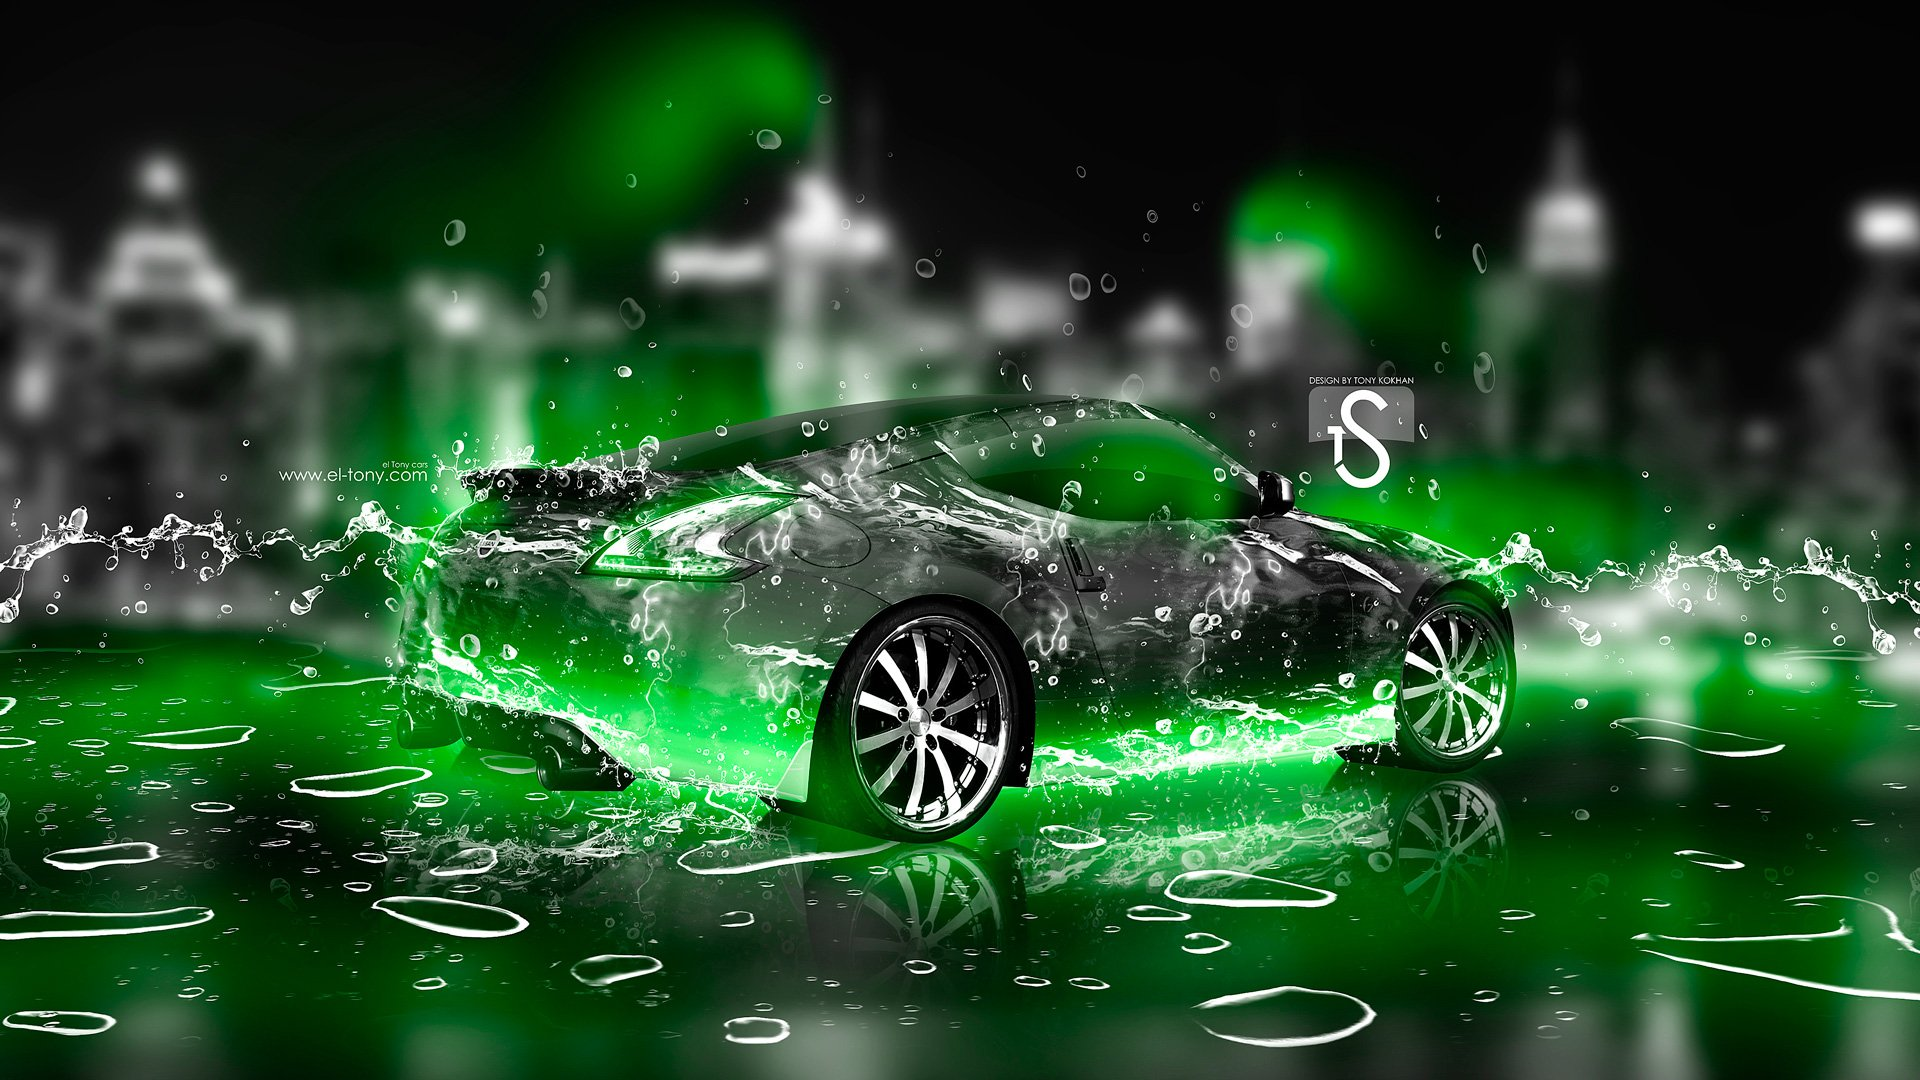 Neon Car Wallpaper: Neon Green HD Wallpaper